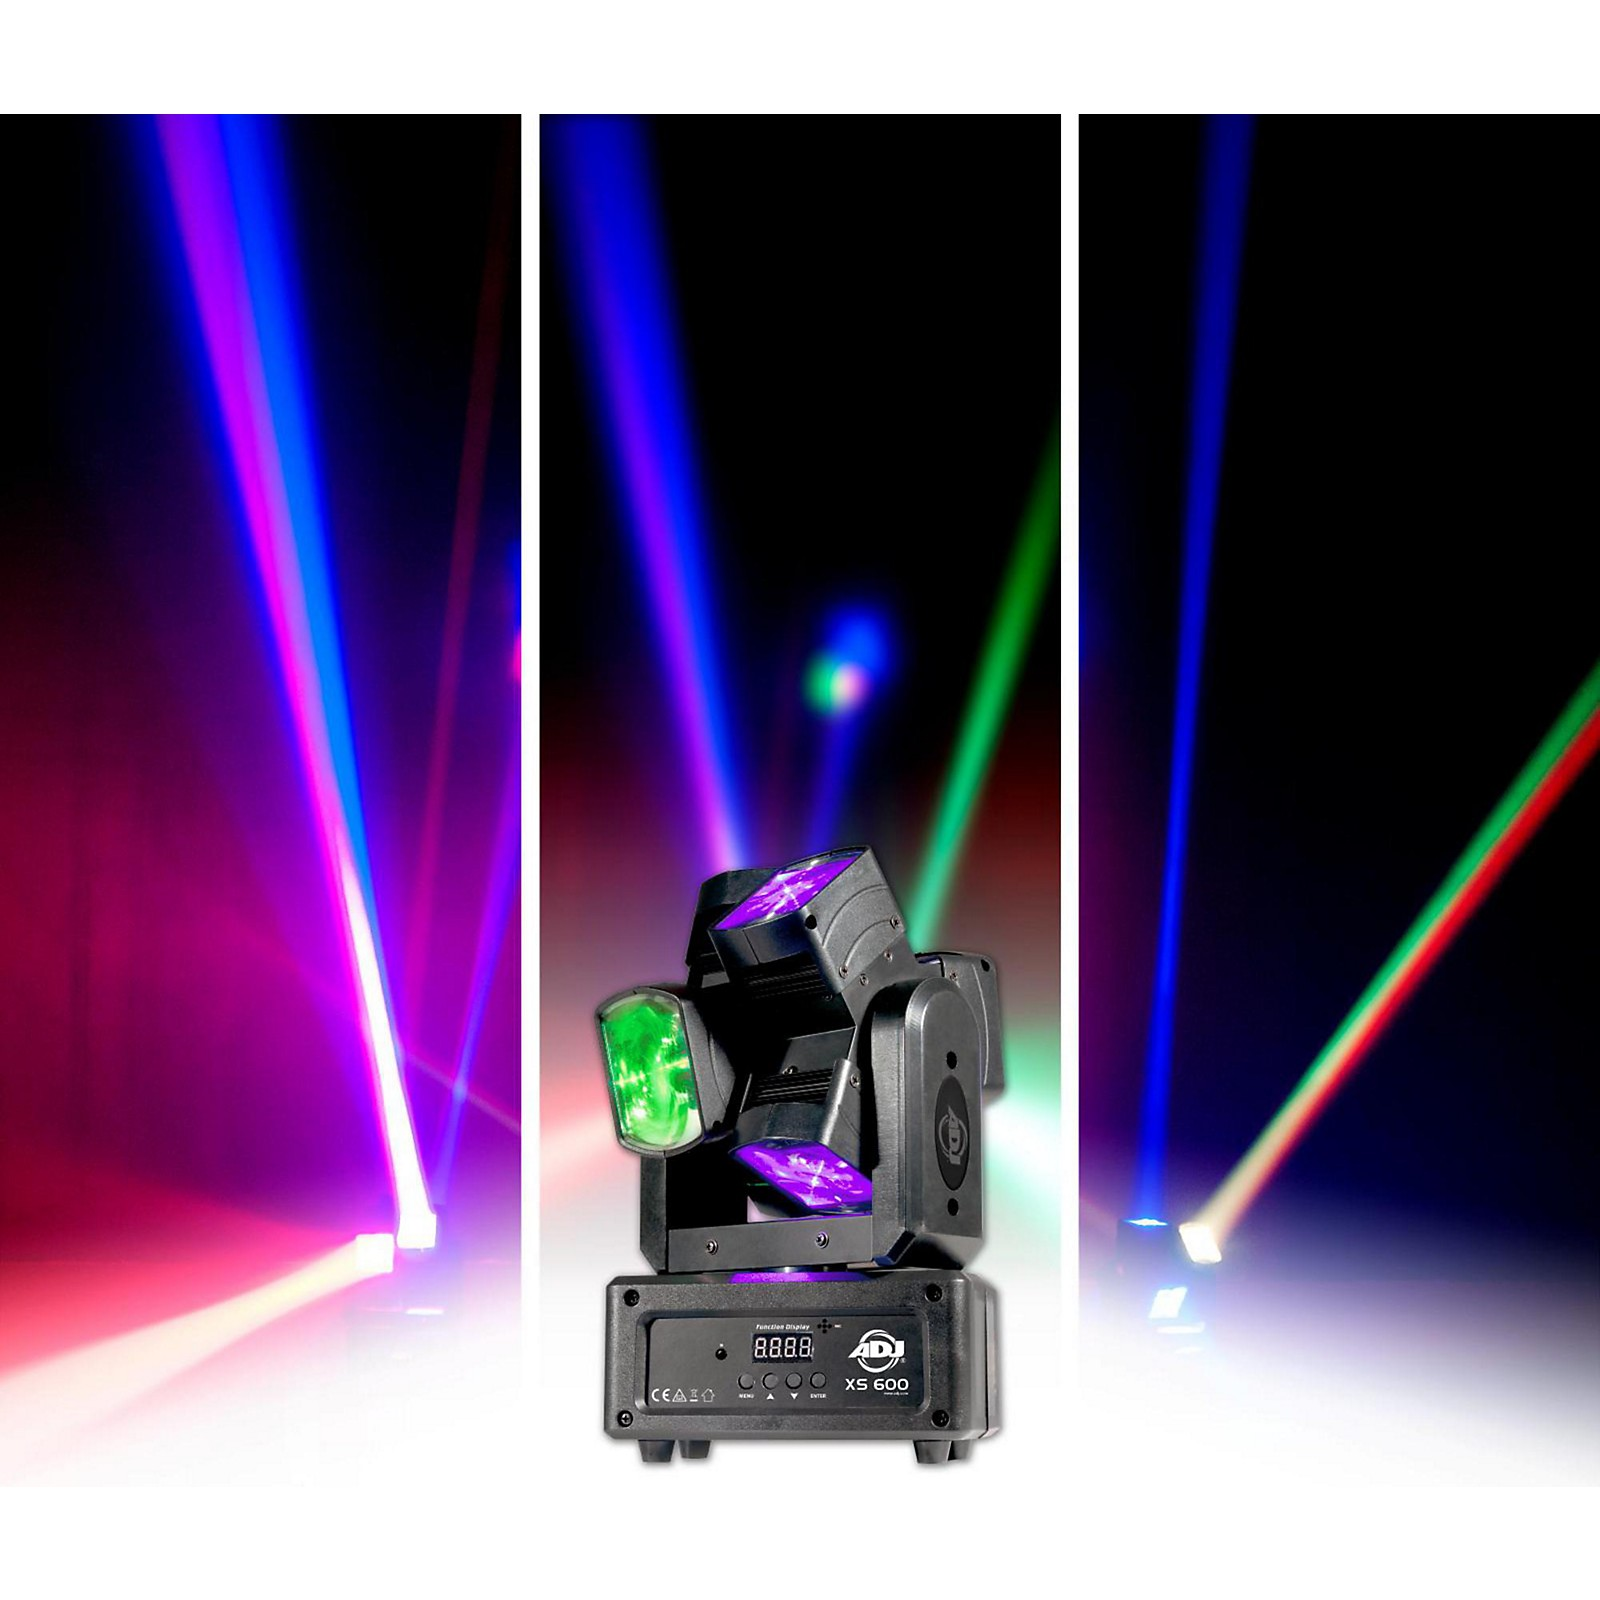 Open Box American DJ XS-600 Dual Moving Head LED Fixture